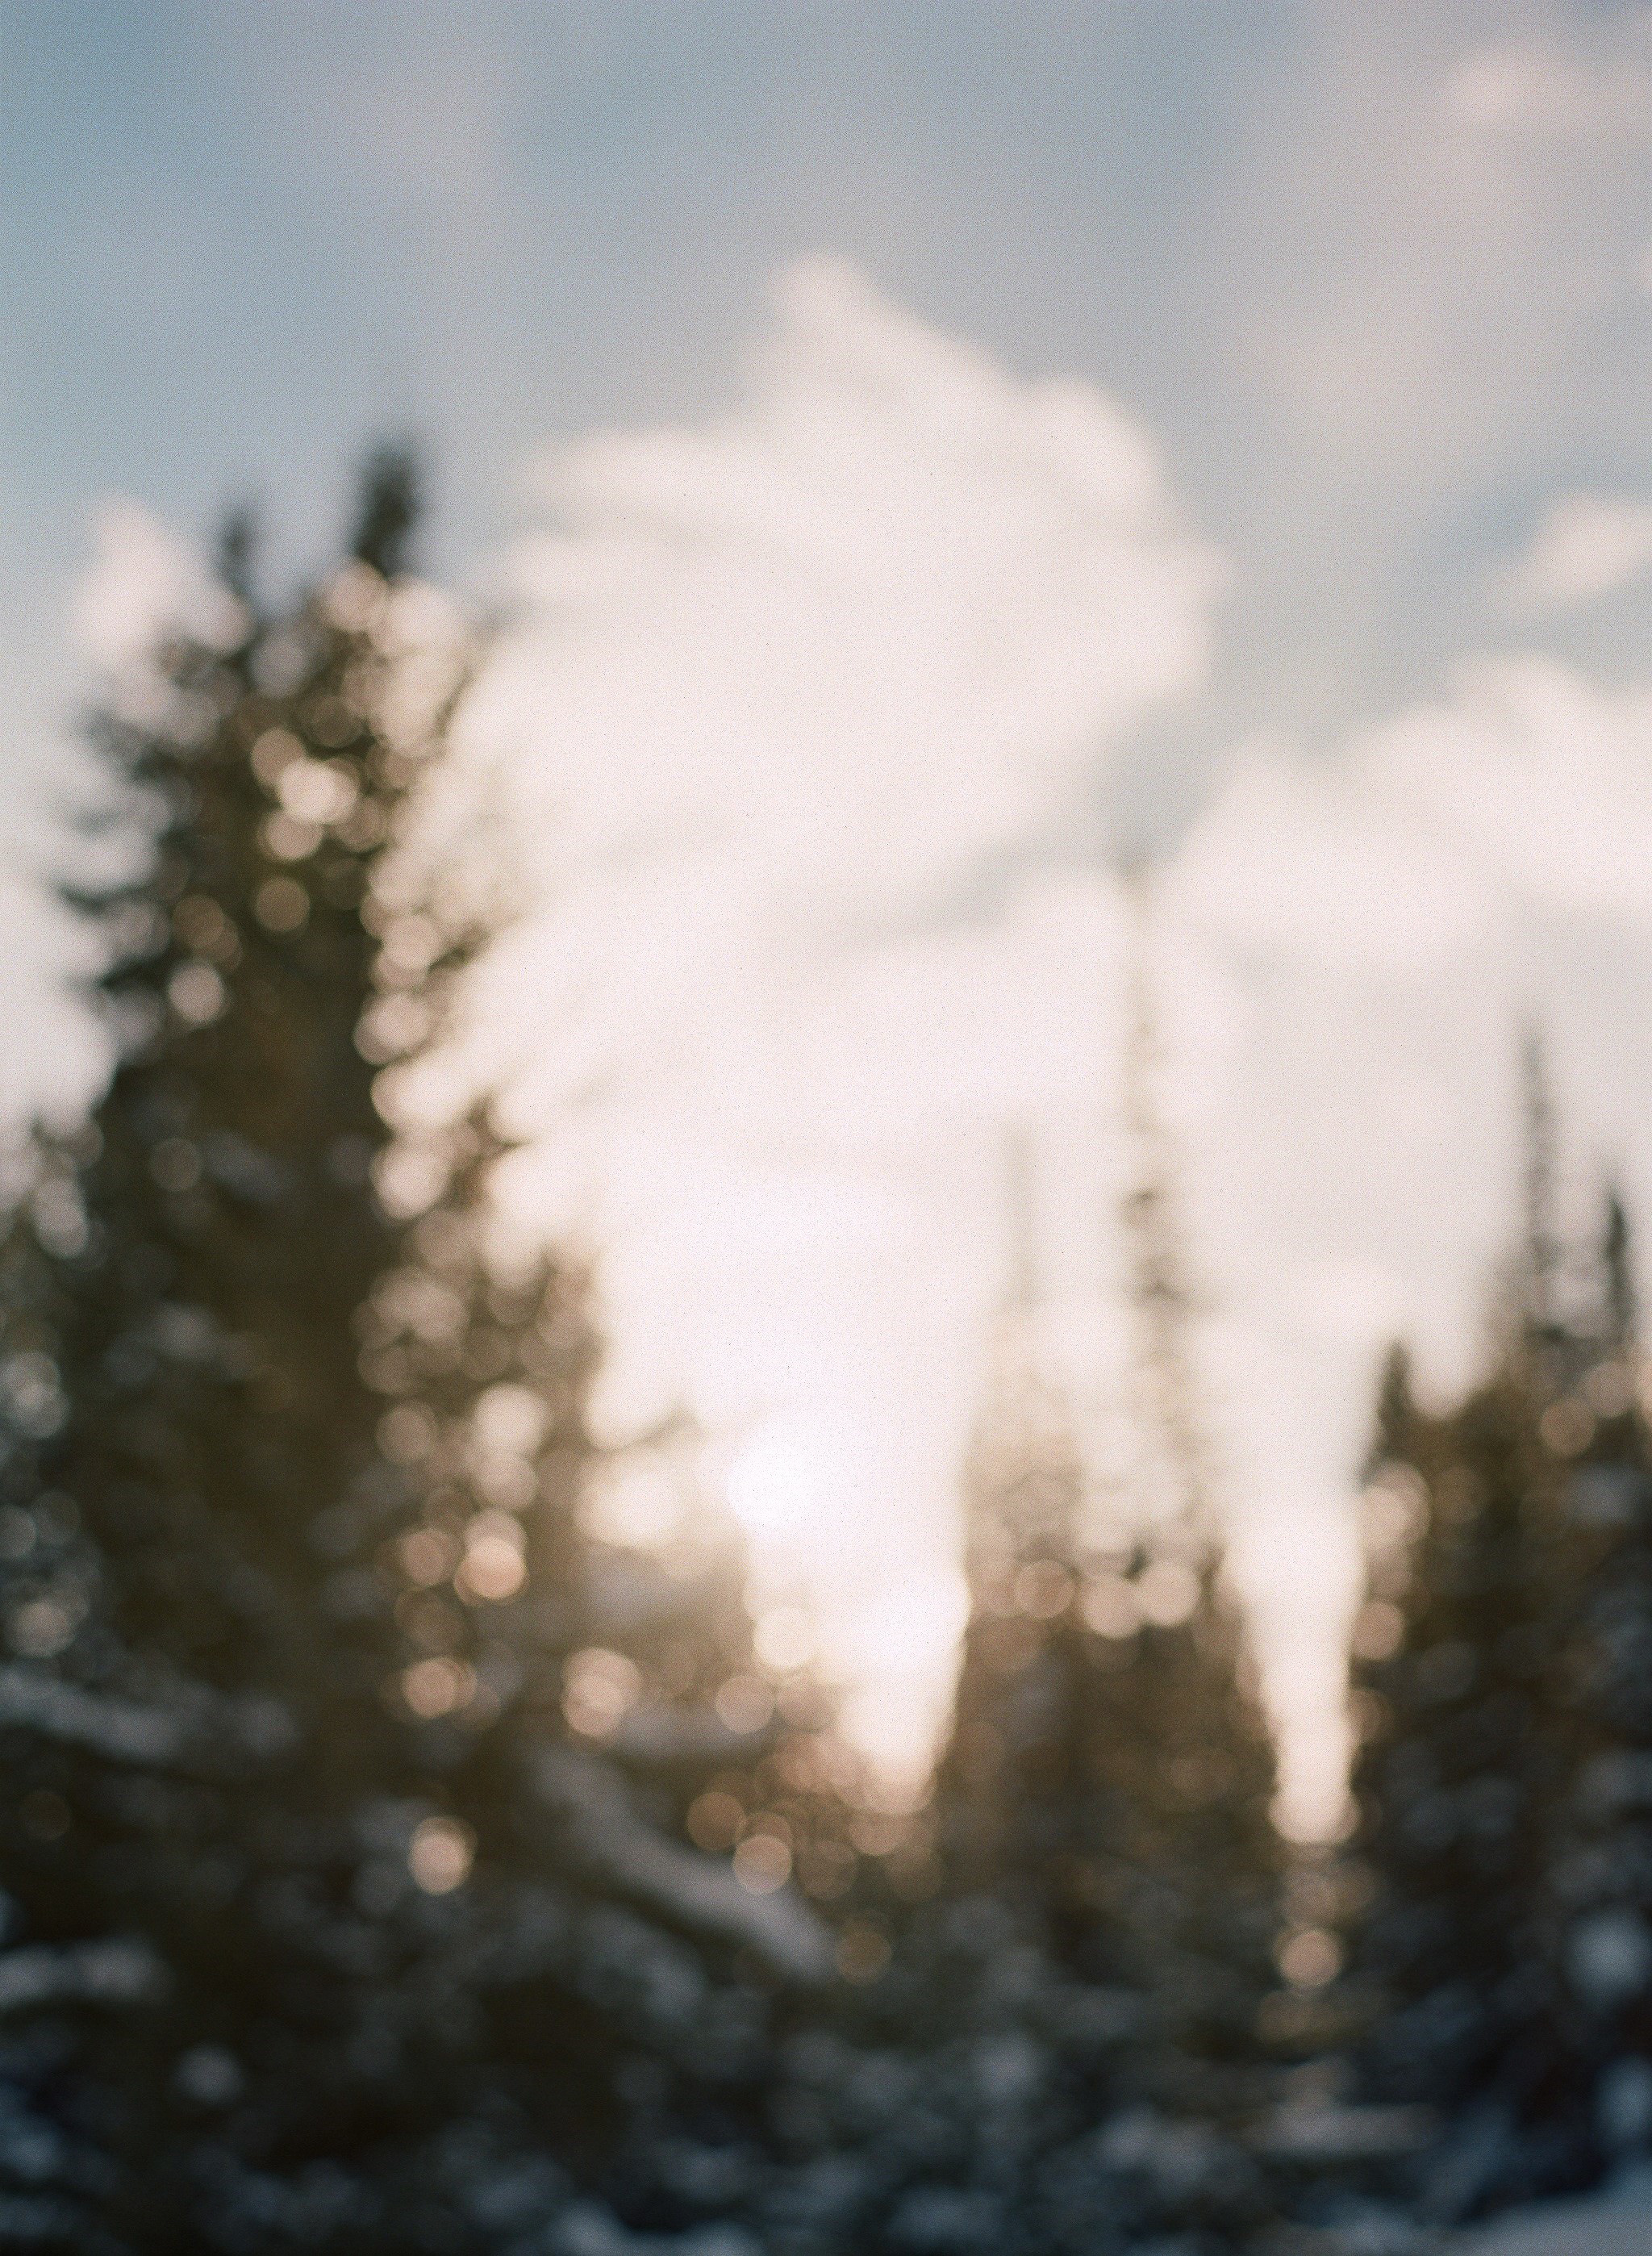 lauramurray-travel-destinationphotography-creativetravel-artists-filmphotography-unearthingtc-blur-pinetrees-snow.jpg